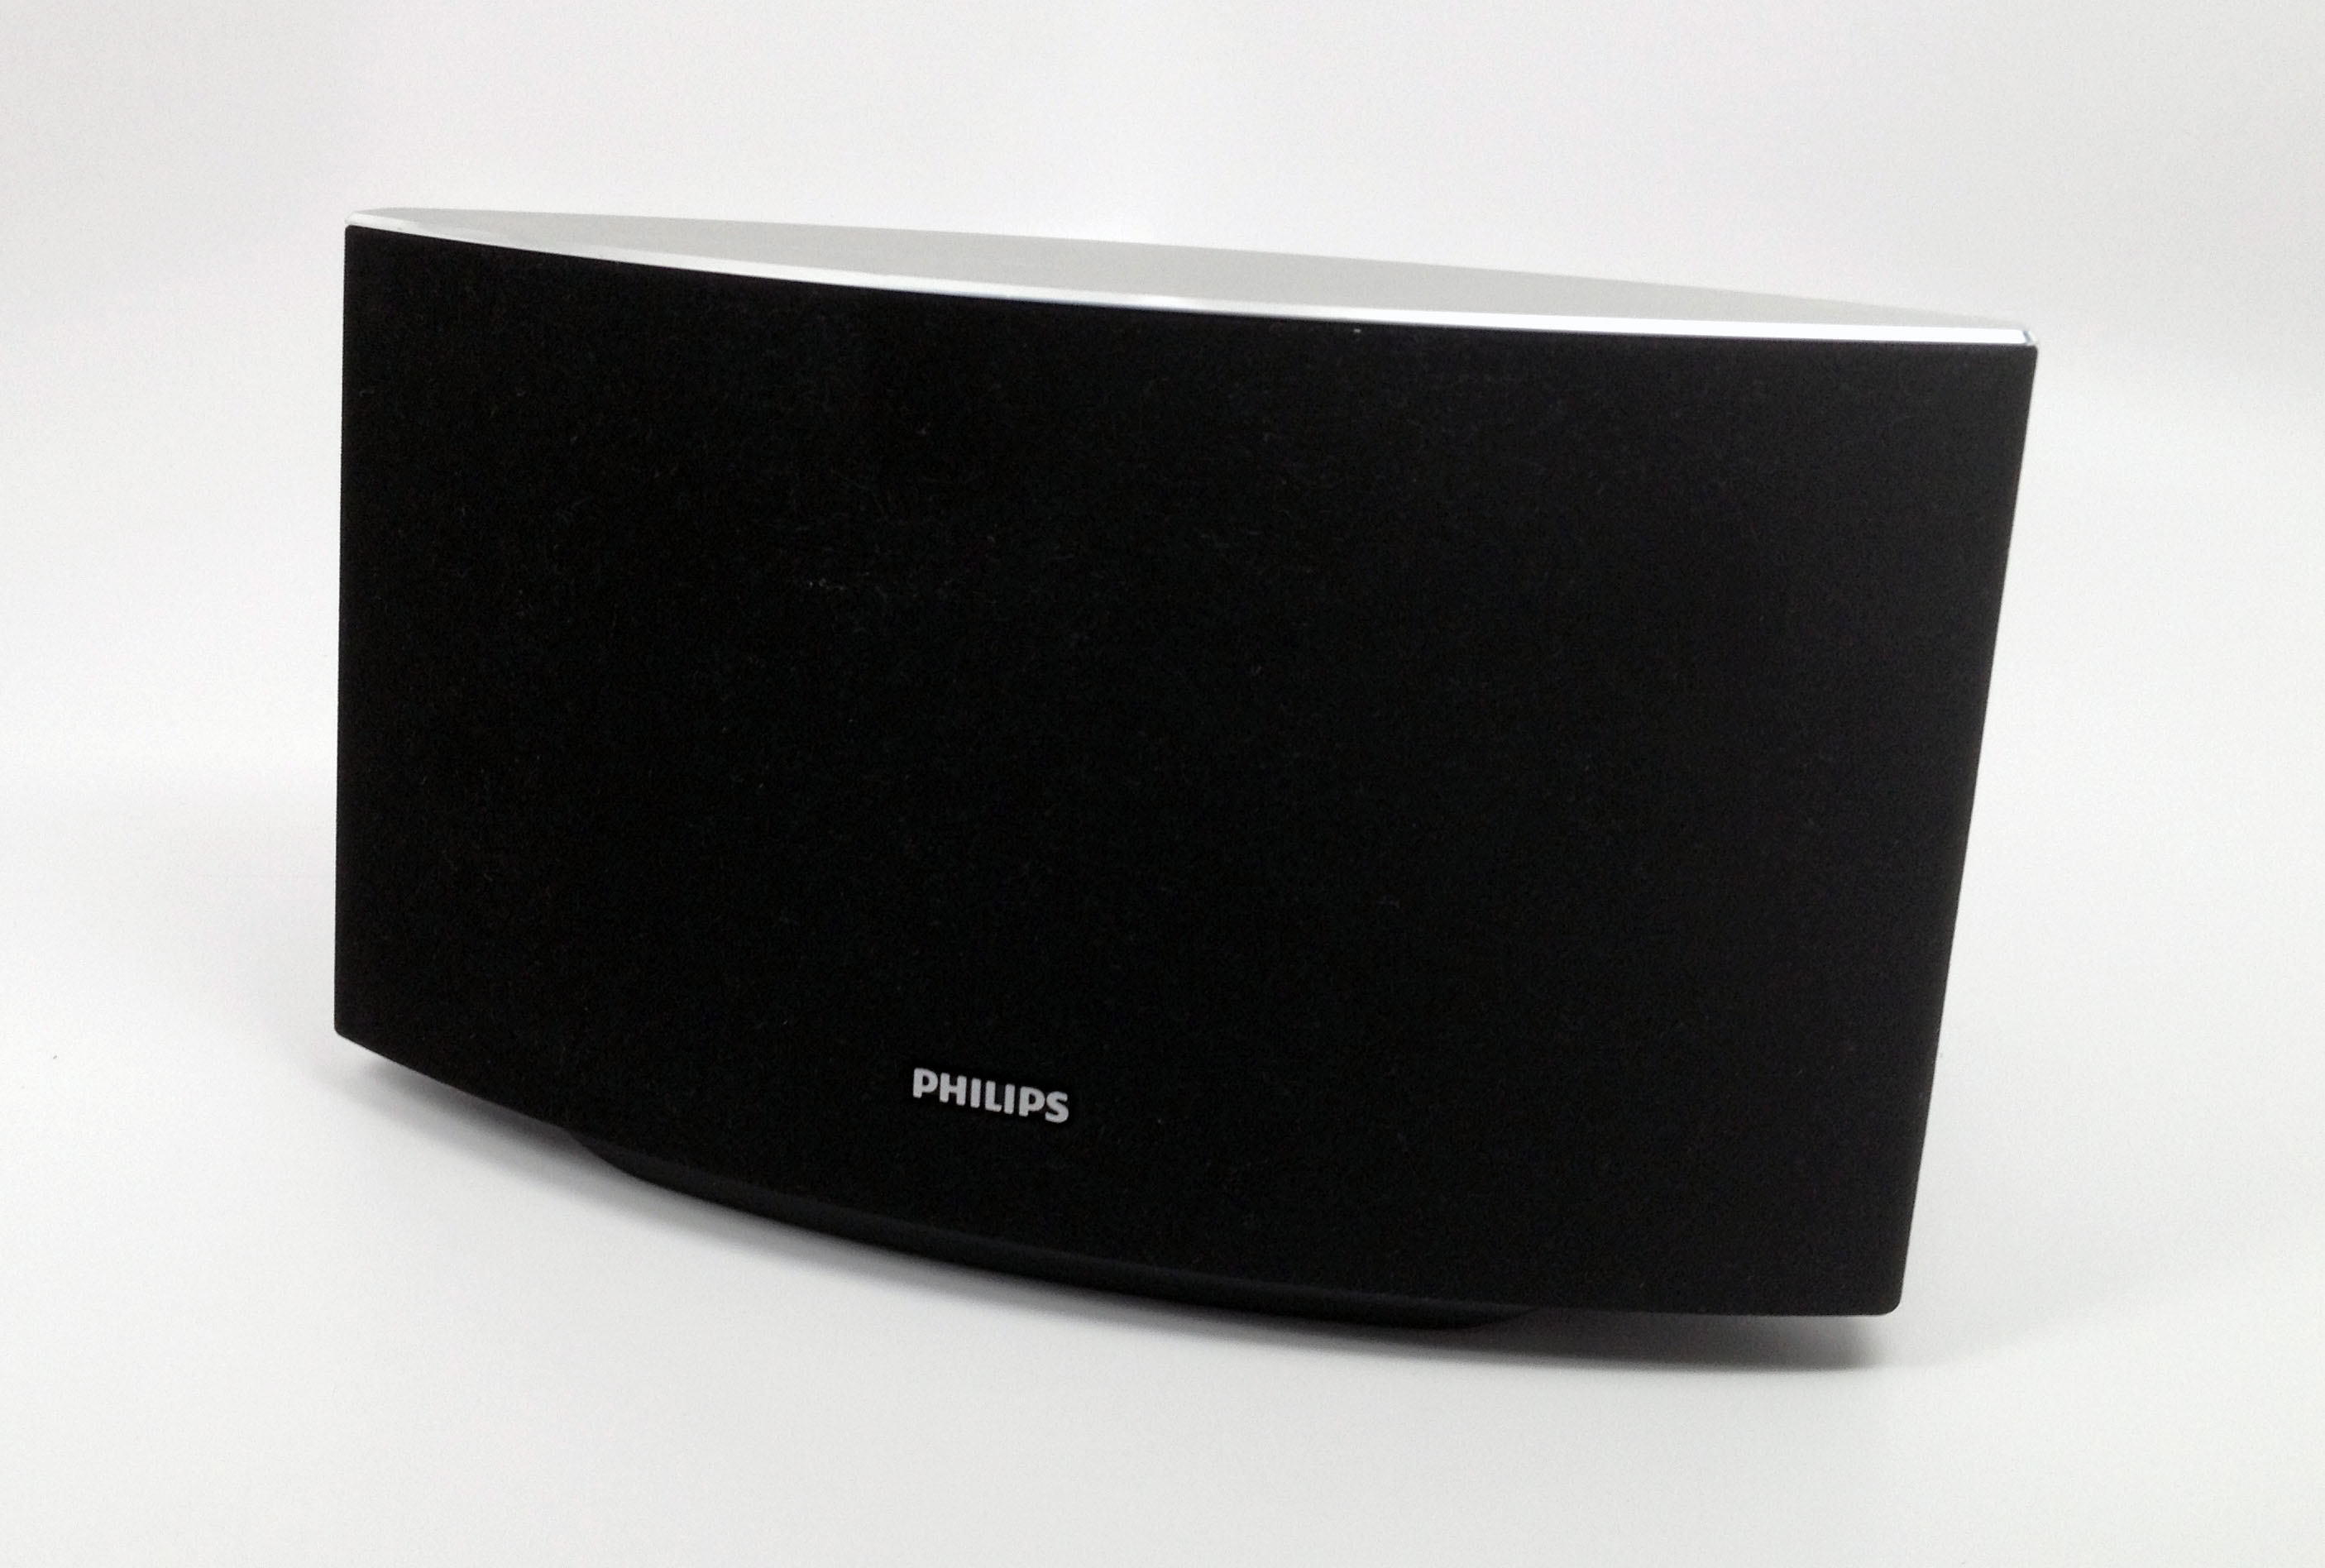 Philips Fidelio SoundAvia AD7000w review